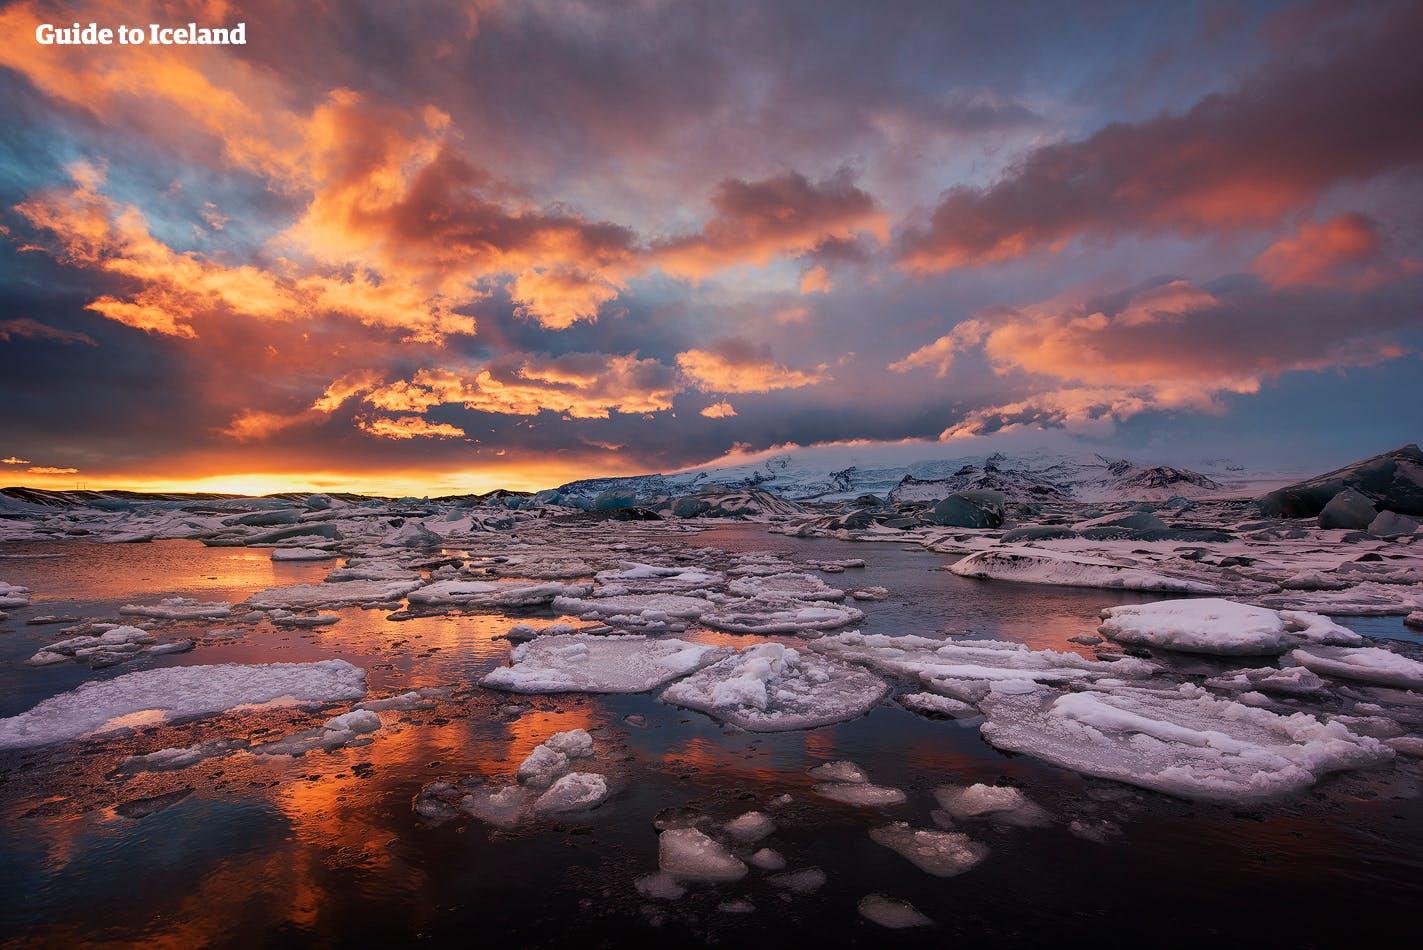 Underneath the midnight sun, the Jökulsárlón glacier lagoon is an arctic wonderland.